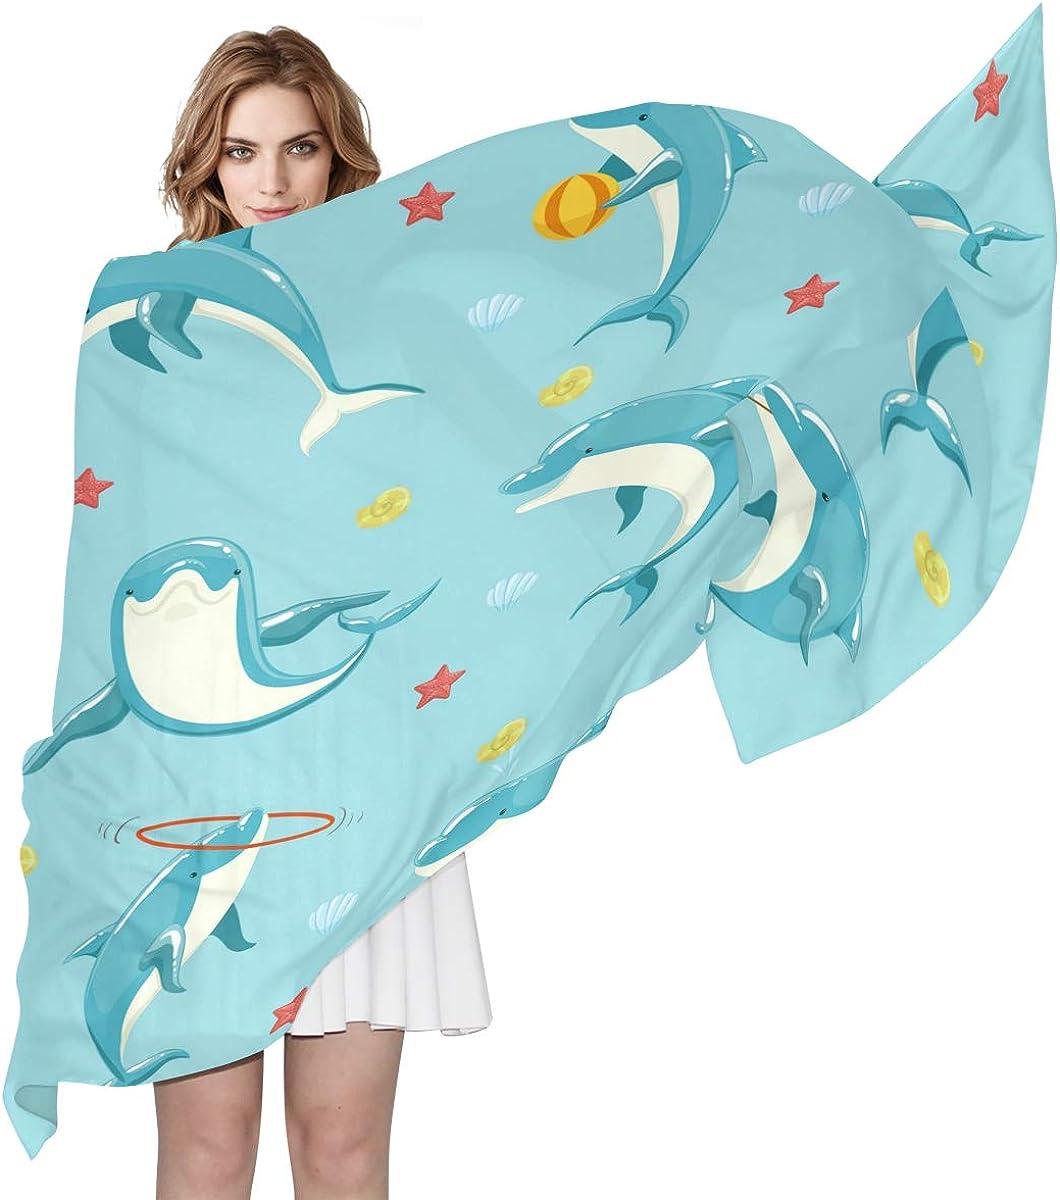 XLING Fashion Scarf Cute Starfish Animal Dolphin Long Lightweight Sunscreen Scarf Shawl Wrap Muffler Neckerchief for Women Men